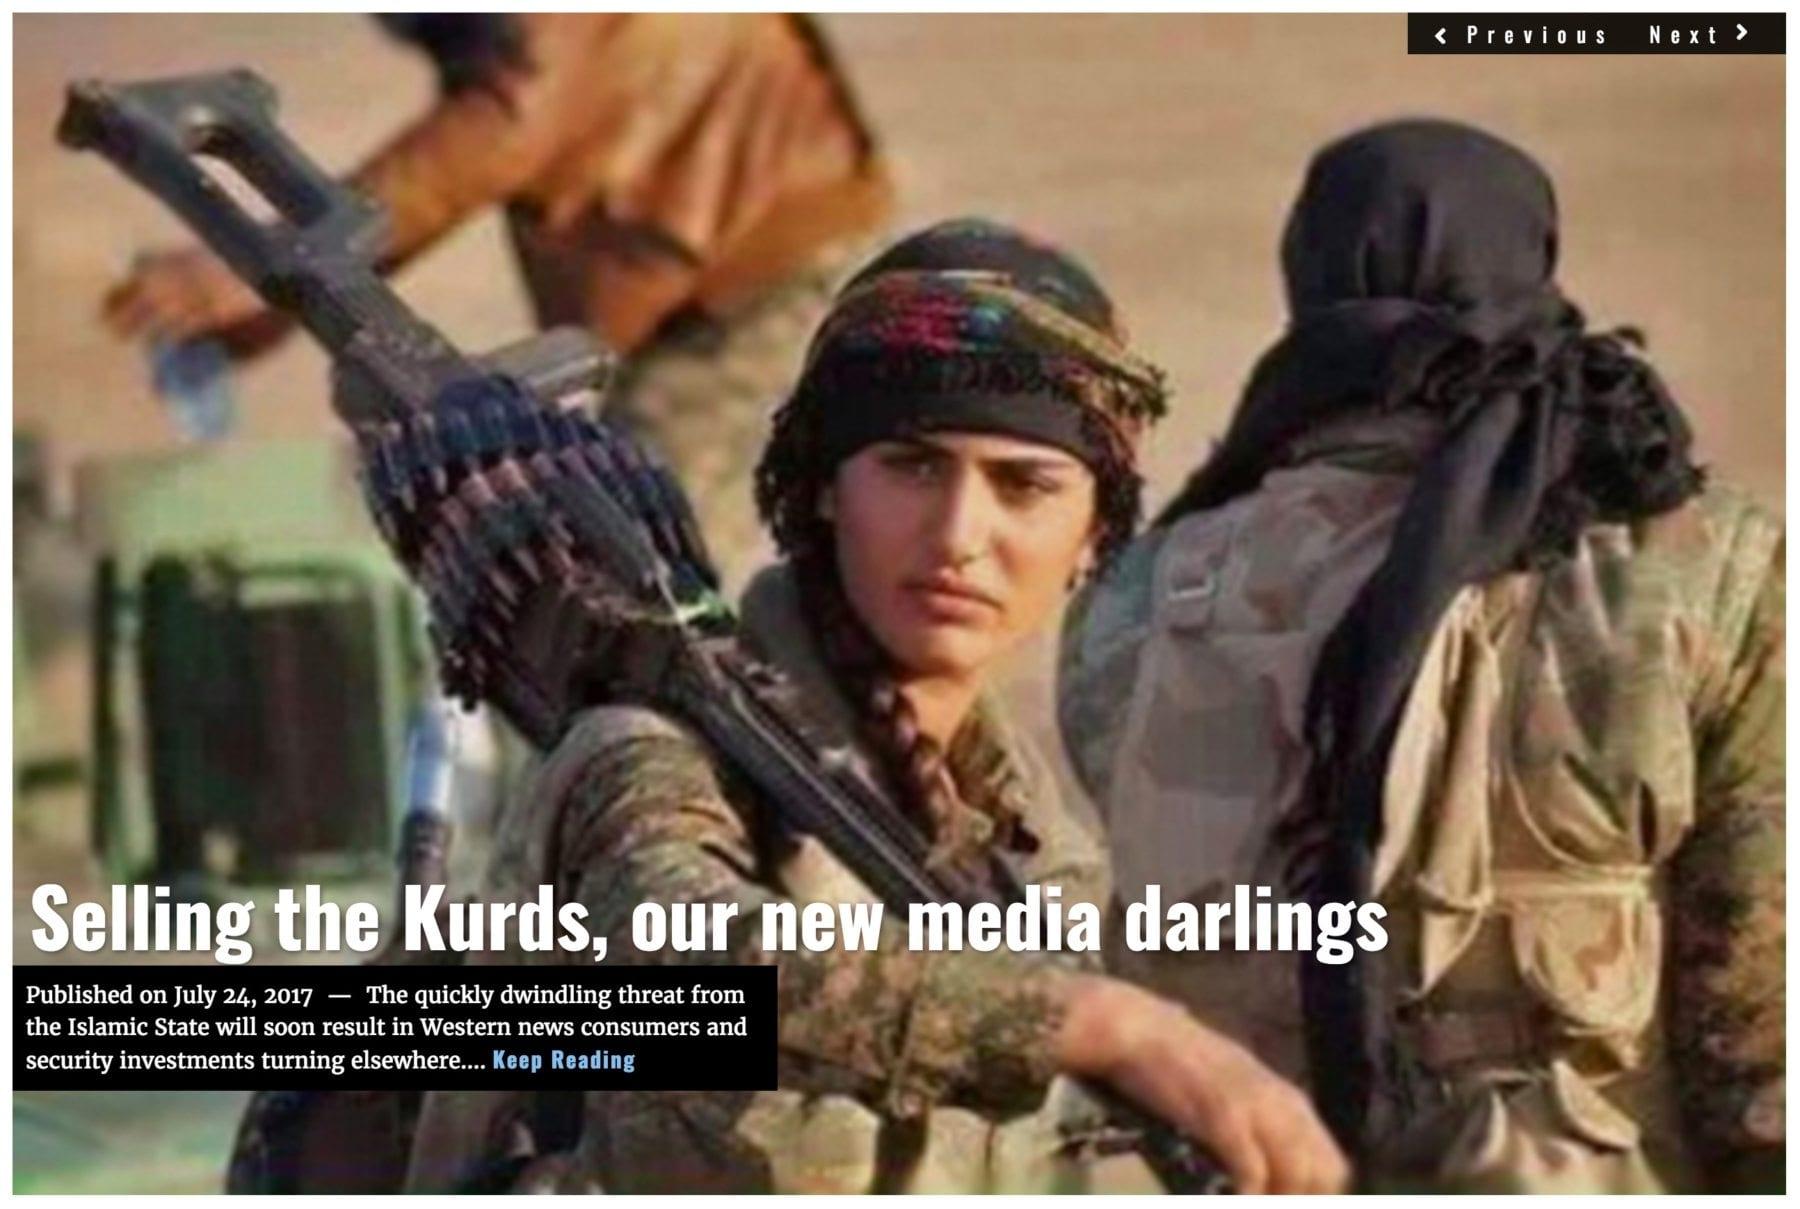 Image Lima Charlie News headline Kurds